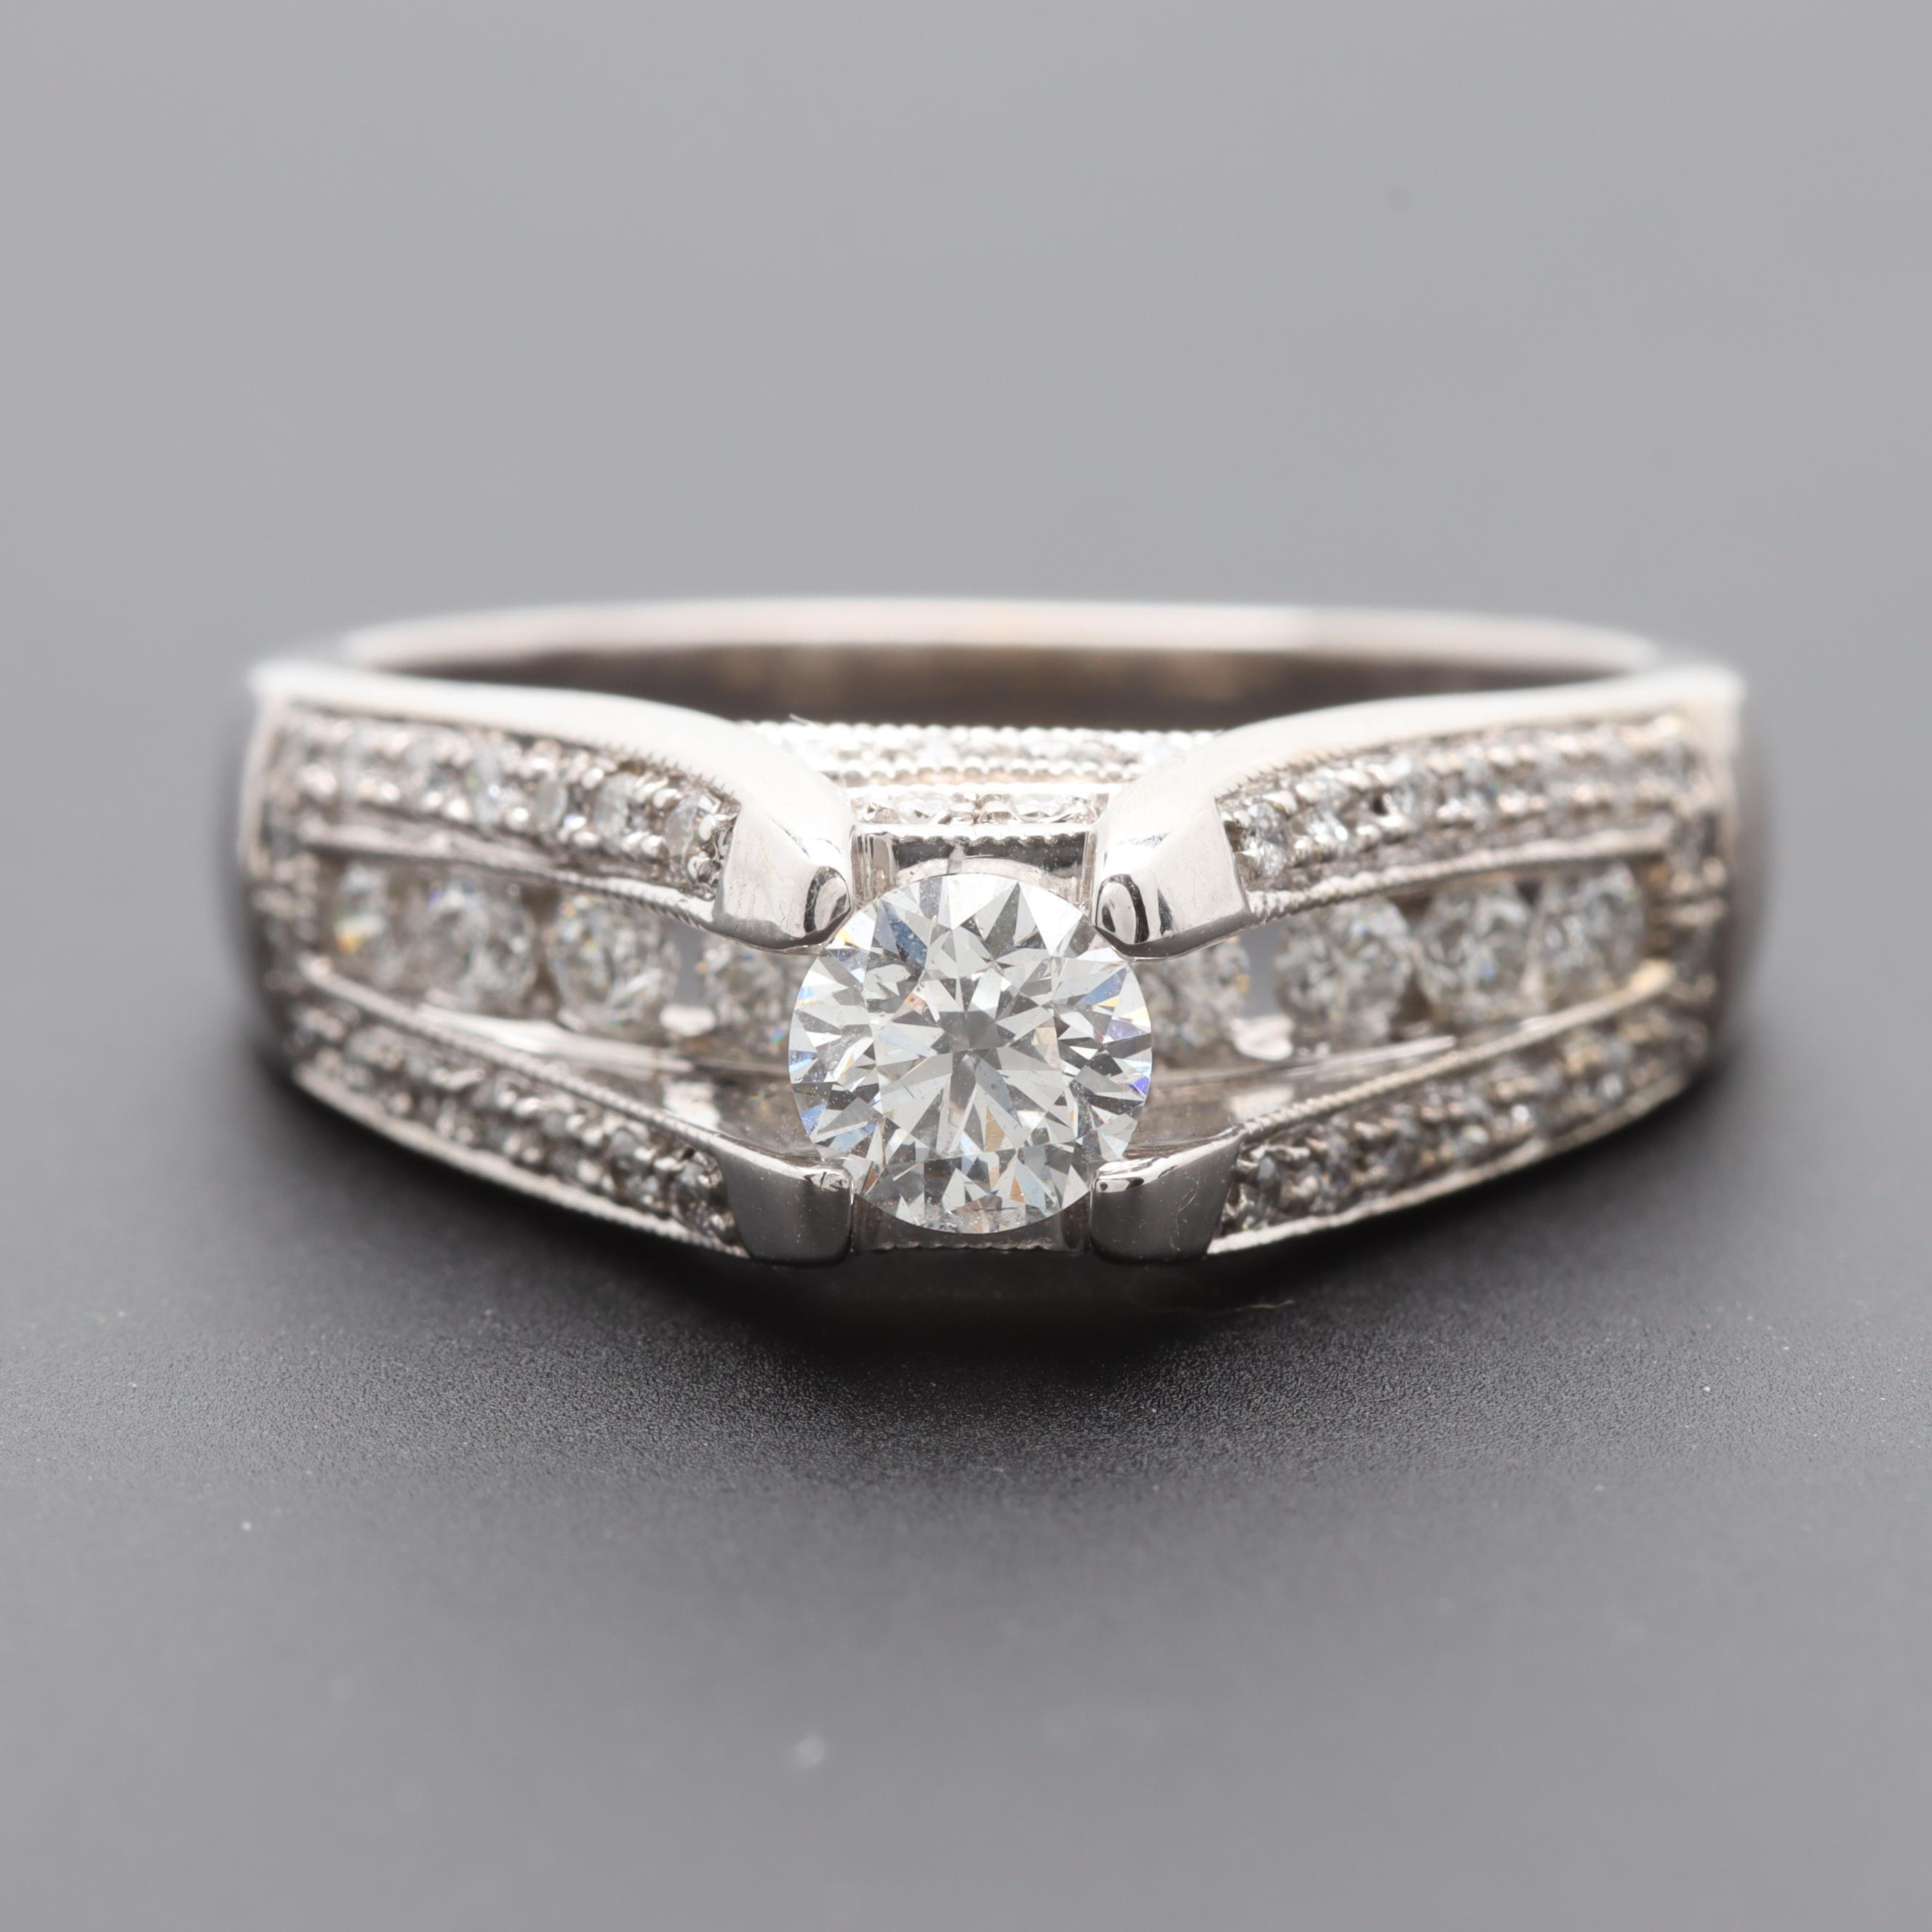 14K White Gold 1.08 CTW Diamond Ring